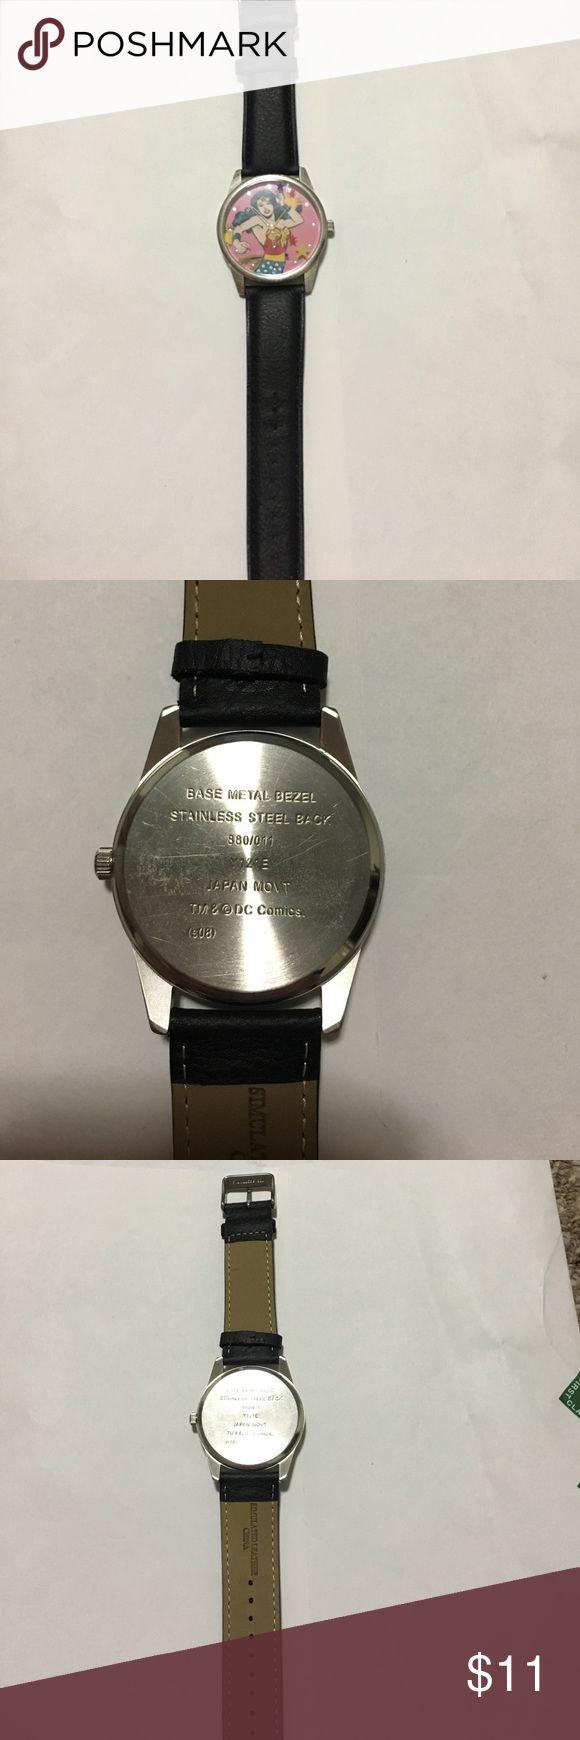 Wonder Woman watch Fun Wonder Women watch! Simulated Leather, stainless steel back. Fun watch! Accessories Watches